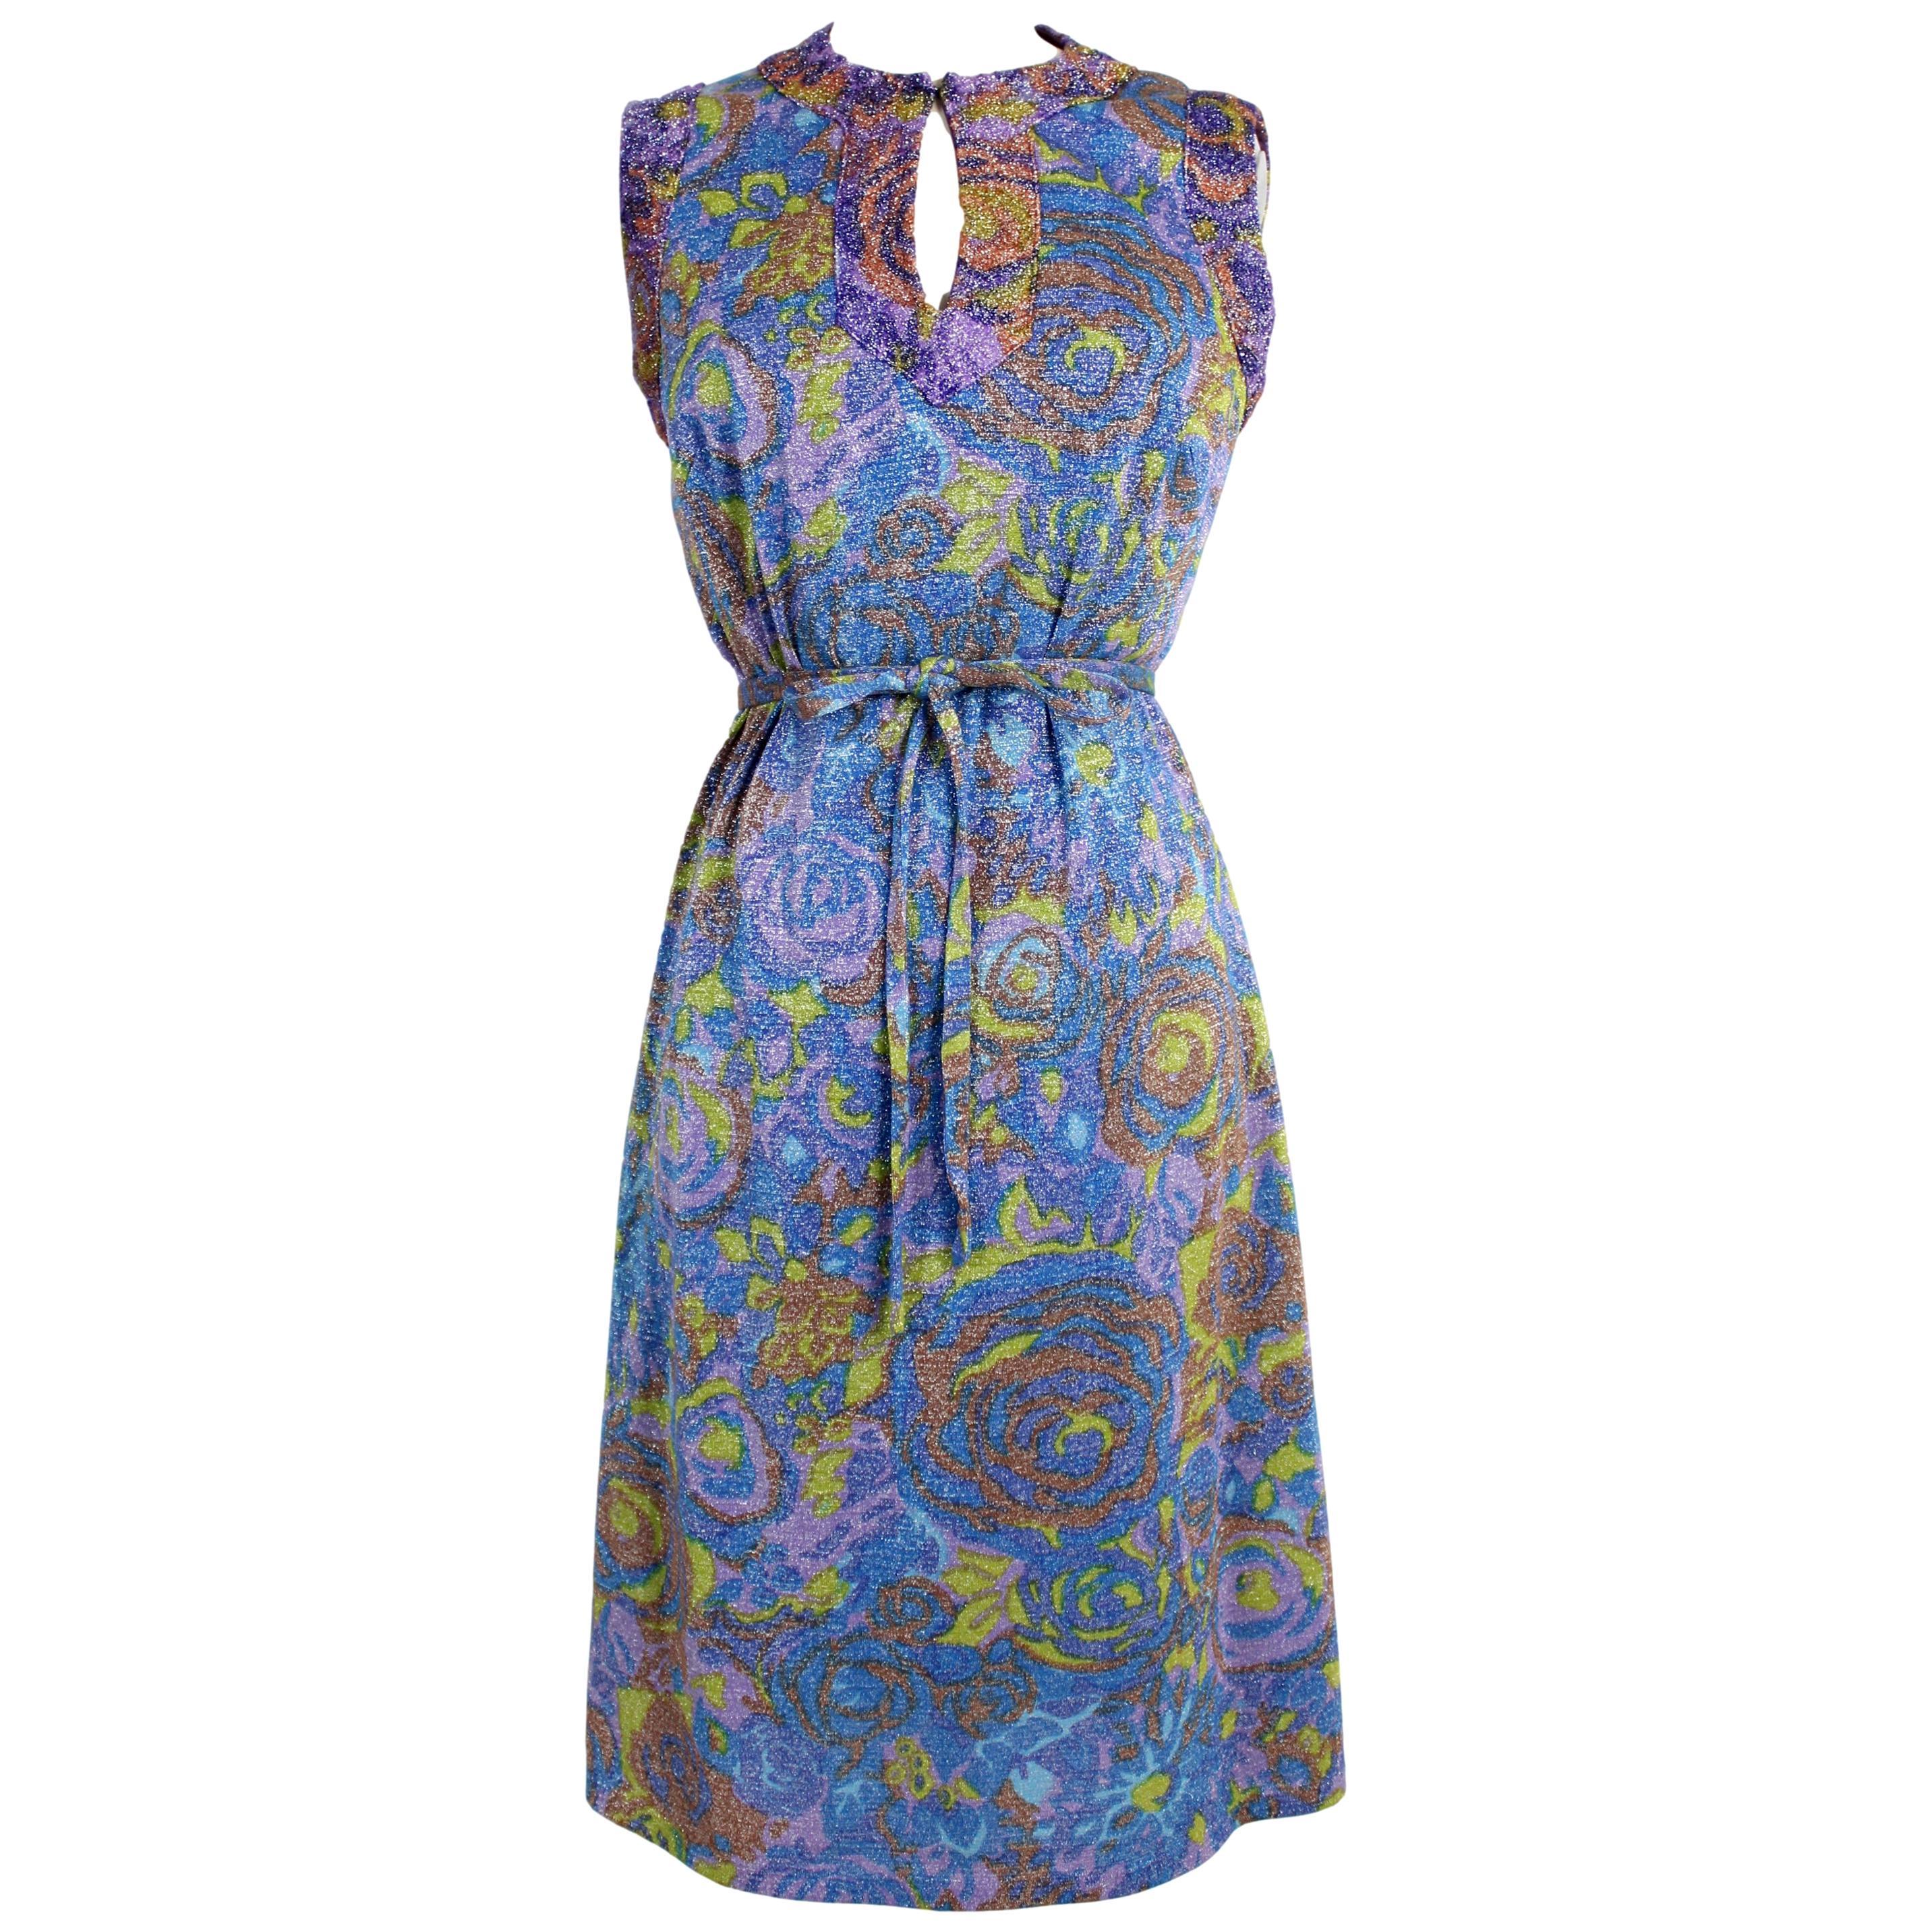 Sorelle Fontana Vintage Dress Blue Lamè Wool Cocktail Party 1960s